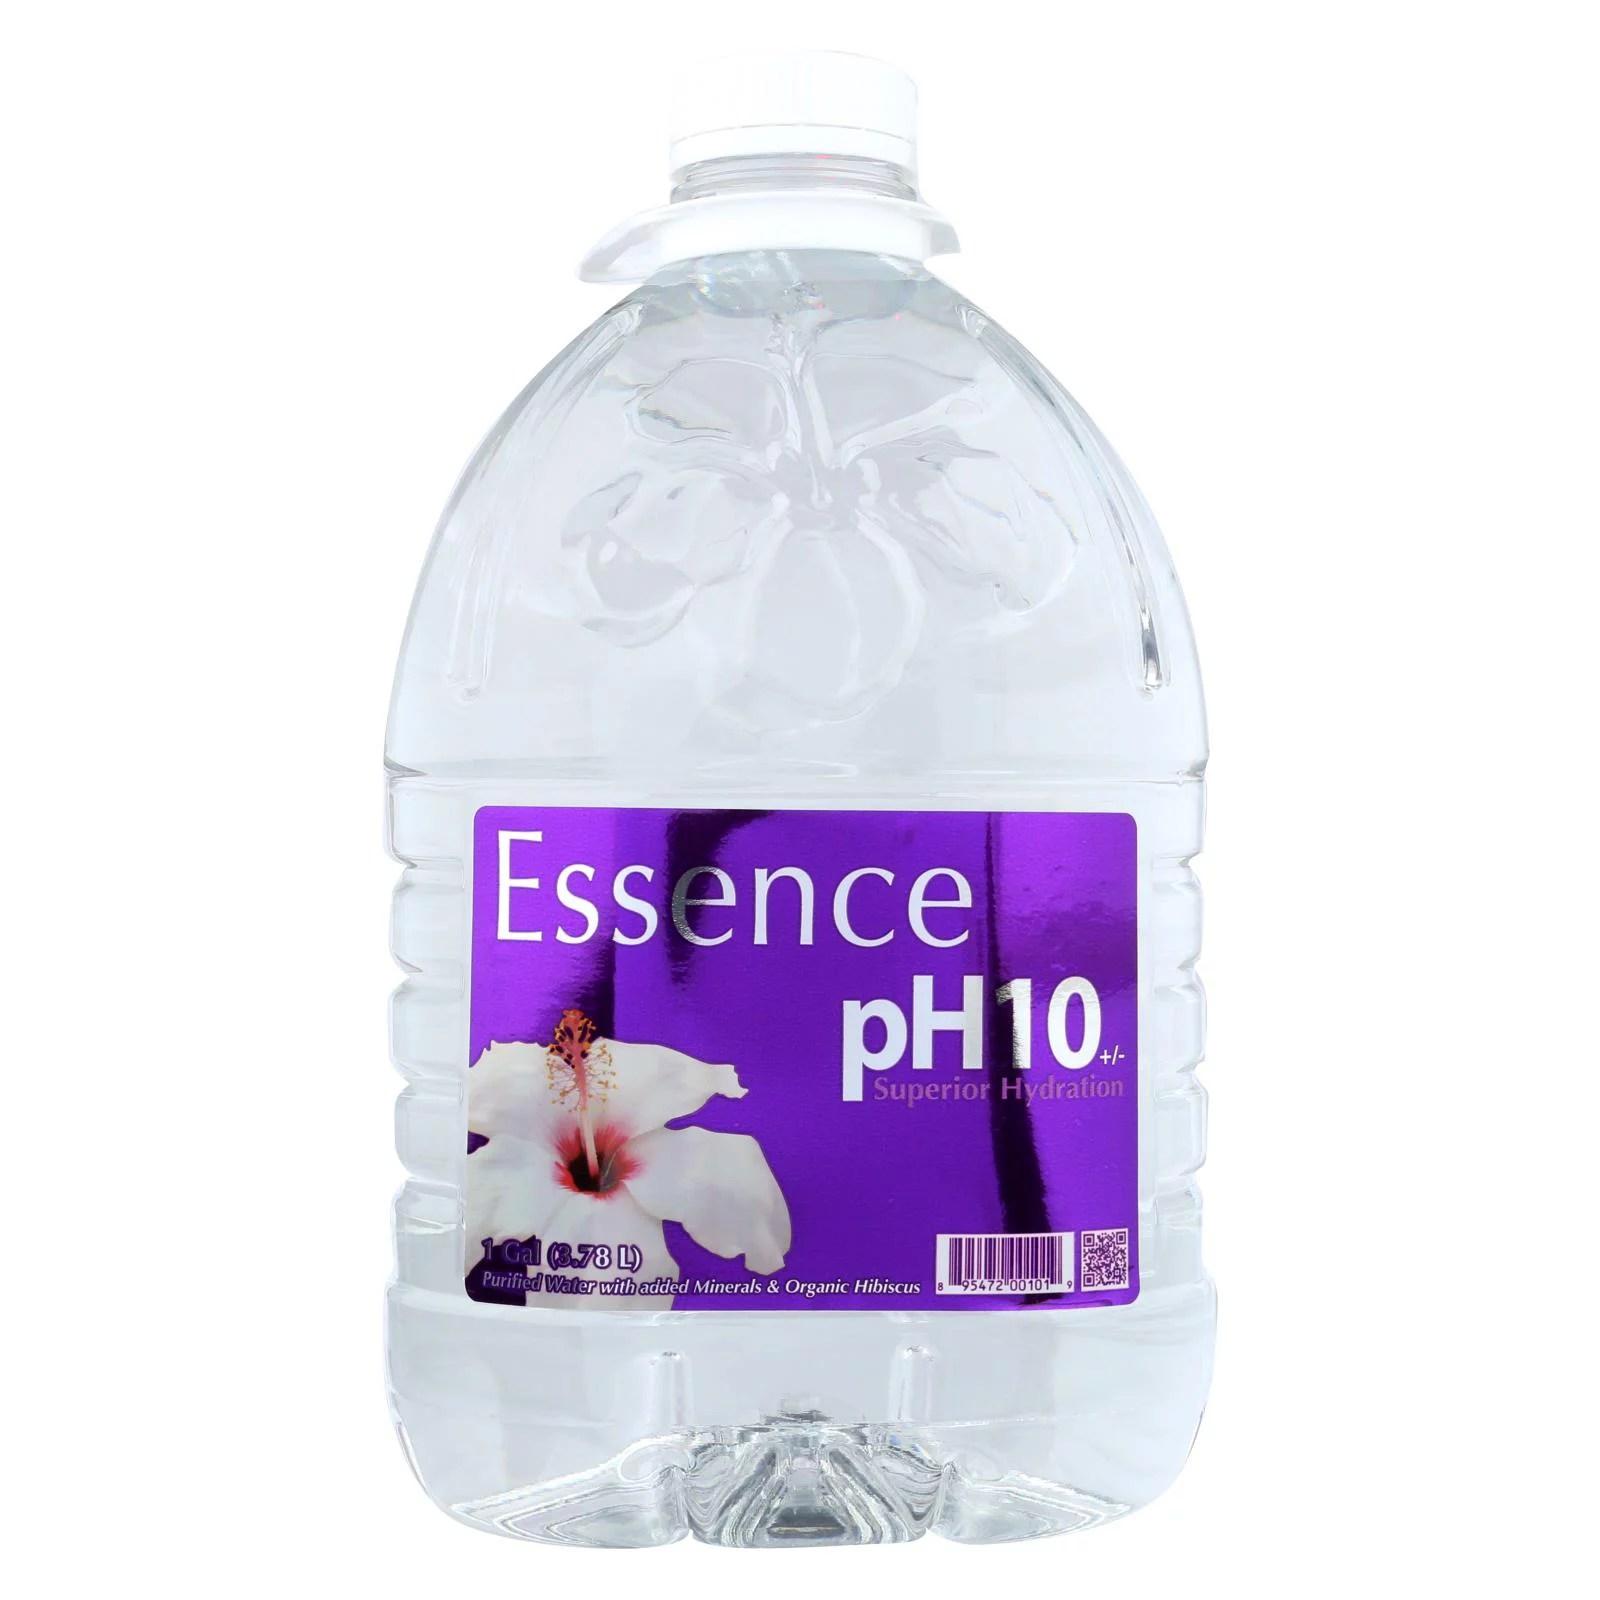 Essence Alkaline Water - Essence Ph10 Water - Gallon ...